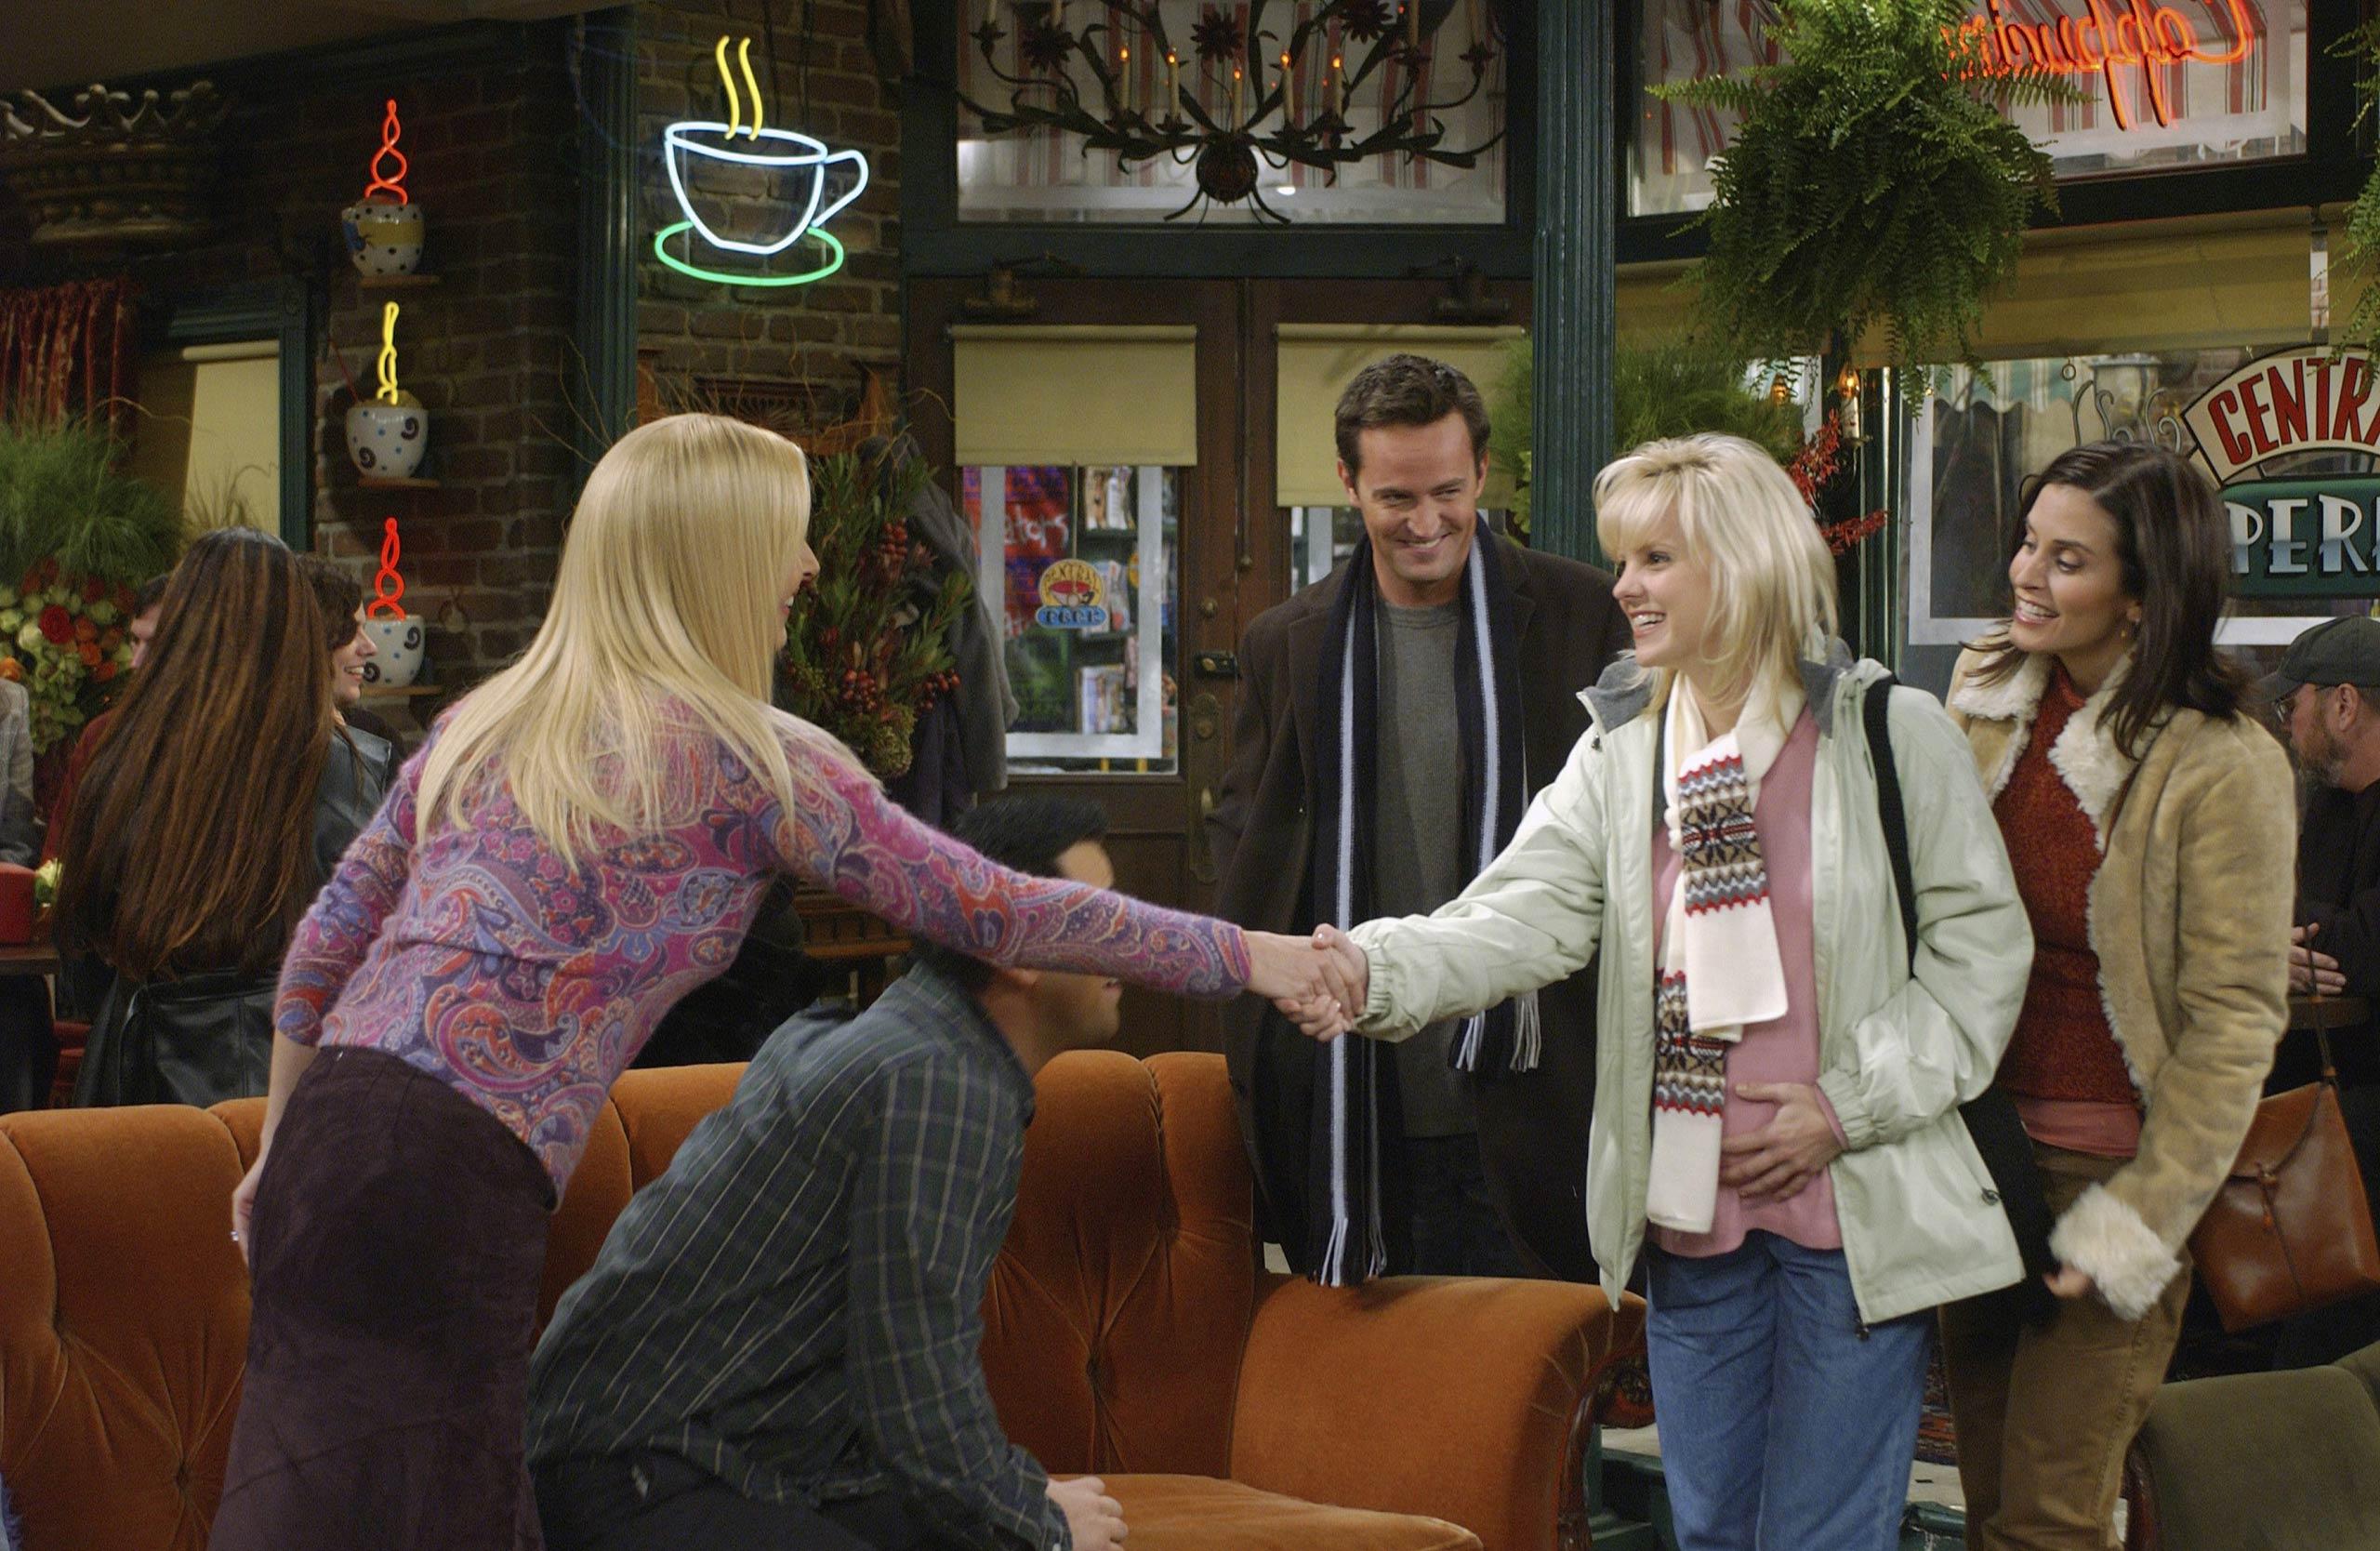 <strong>Anna Faris</strong> – Anna Faris had a season-long role as Erica, whose twins Chandler and Monica adopt